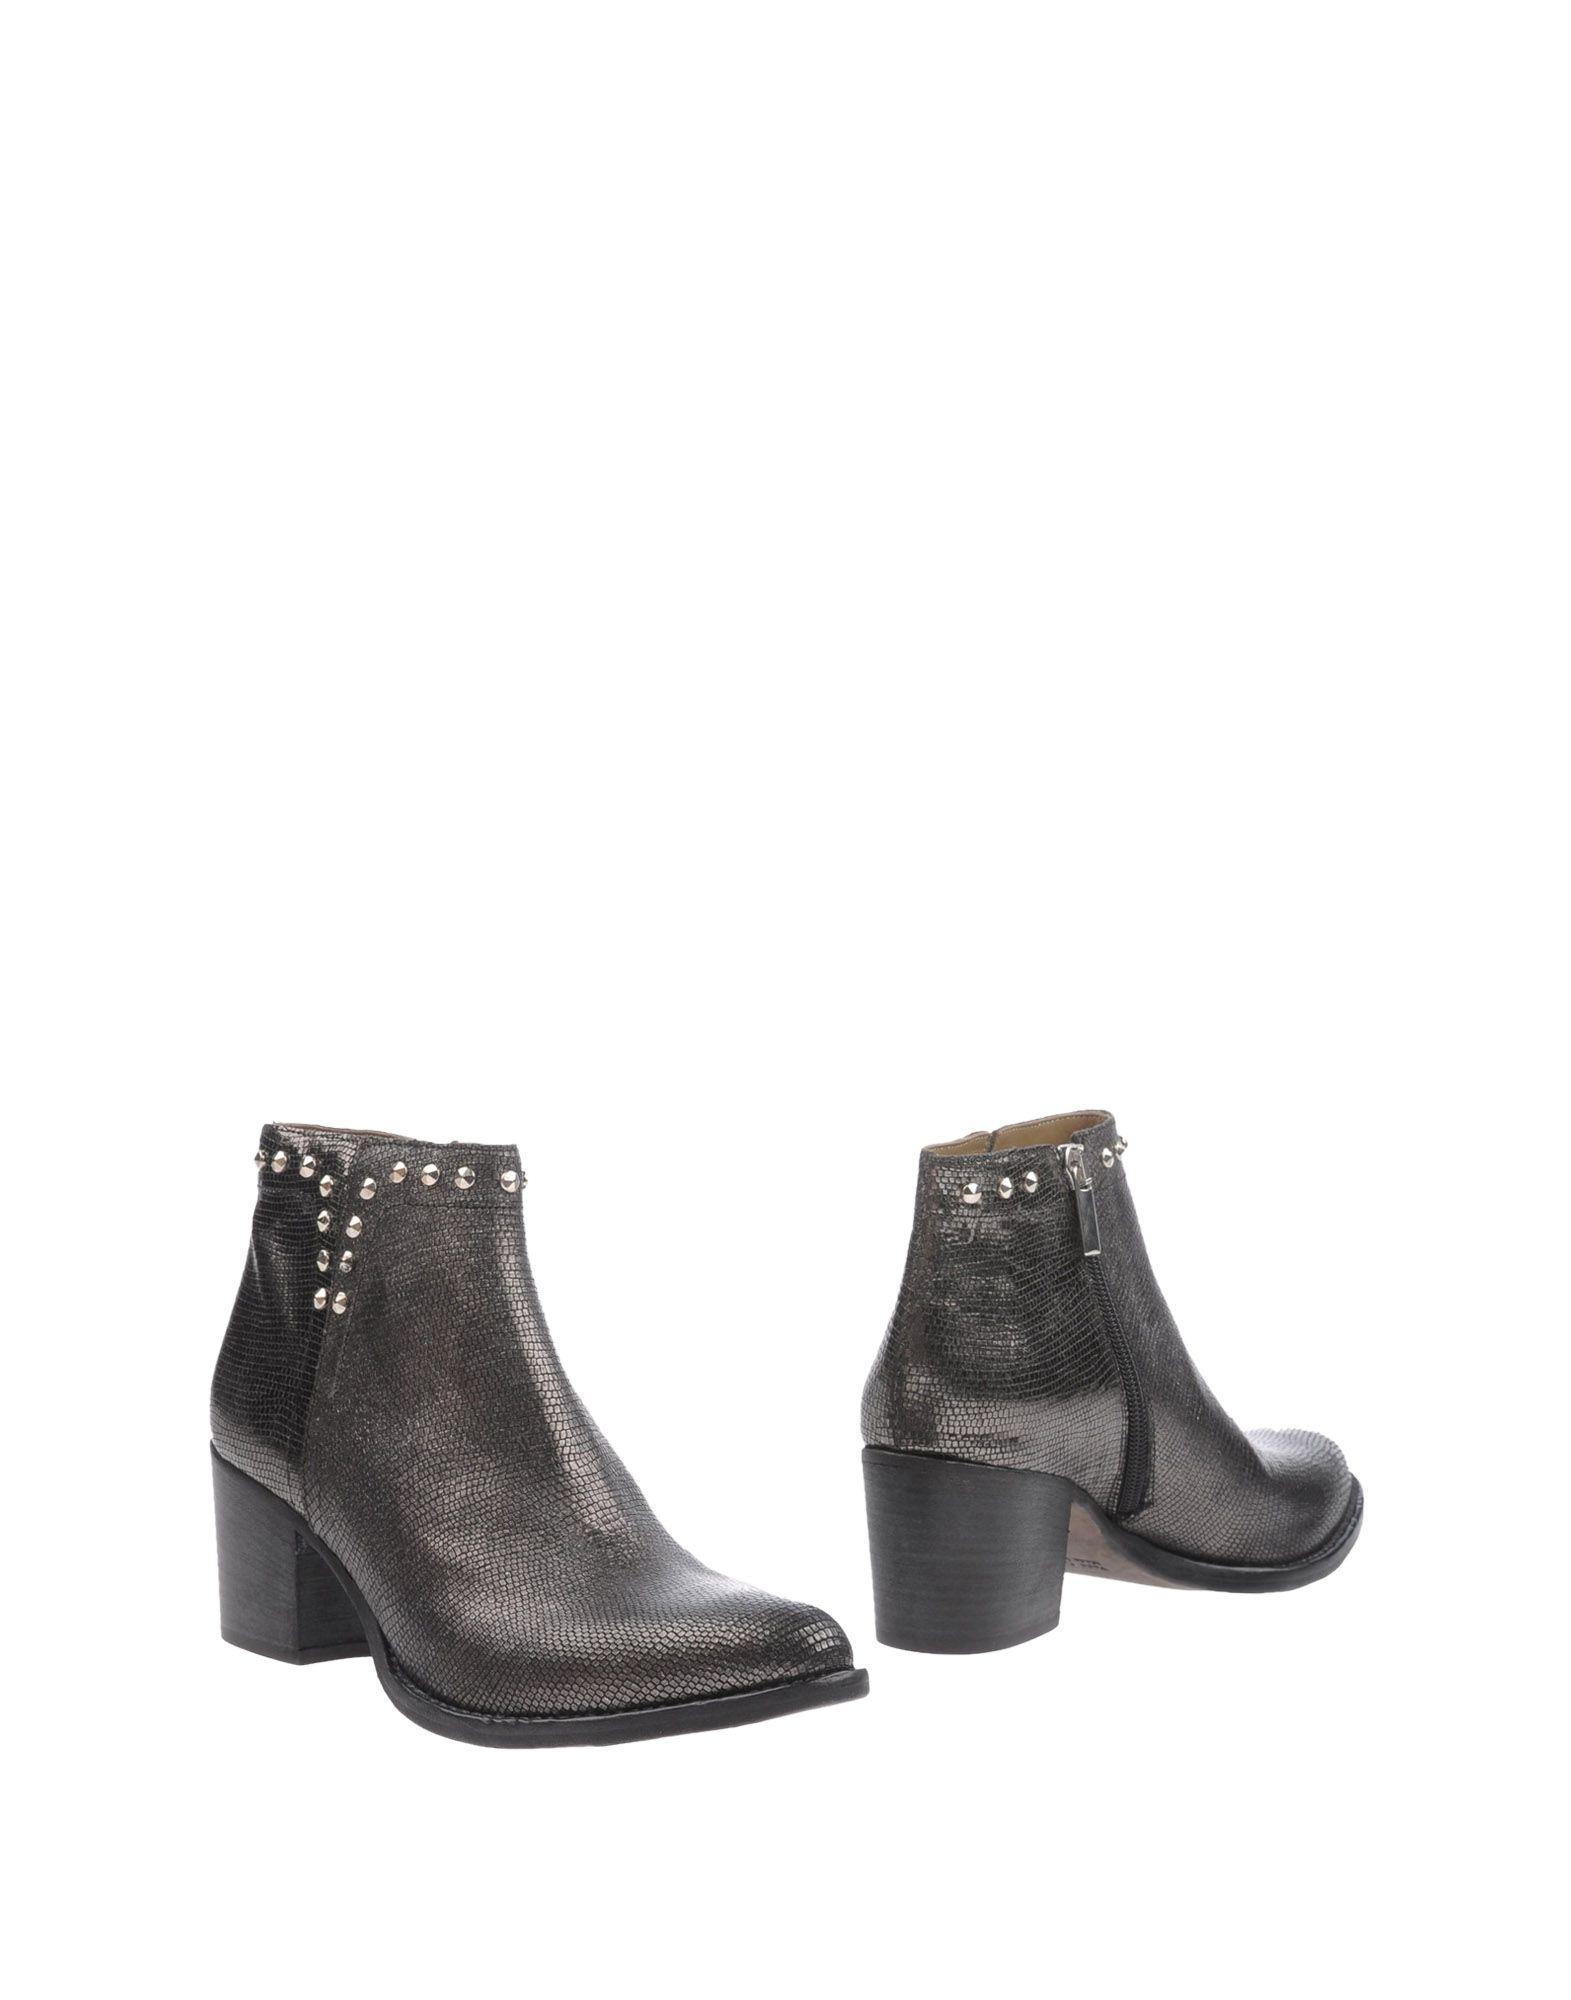 DUCCIO DEL DUCA Полусапоги и высокие ботинки magazzini del sale полусапоги и высокие ботинки